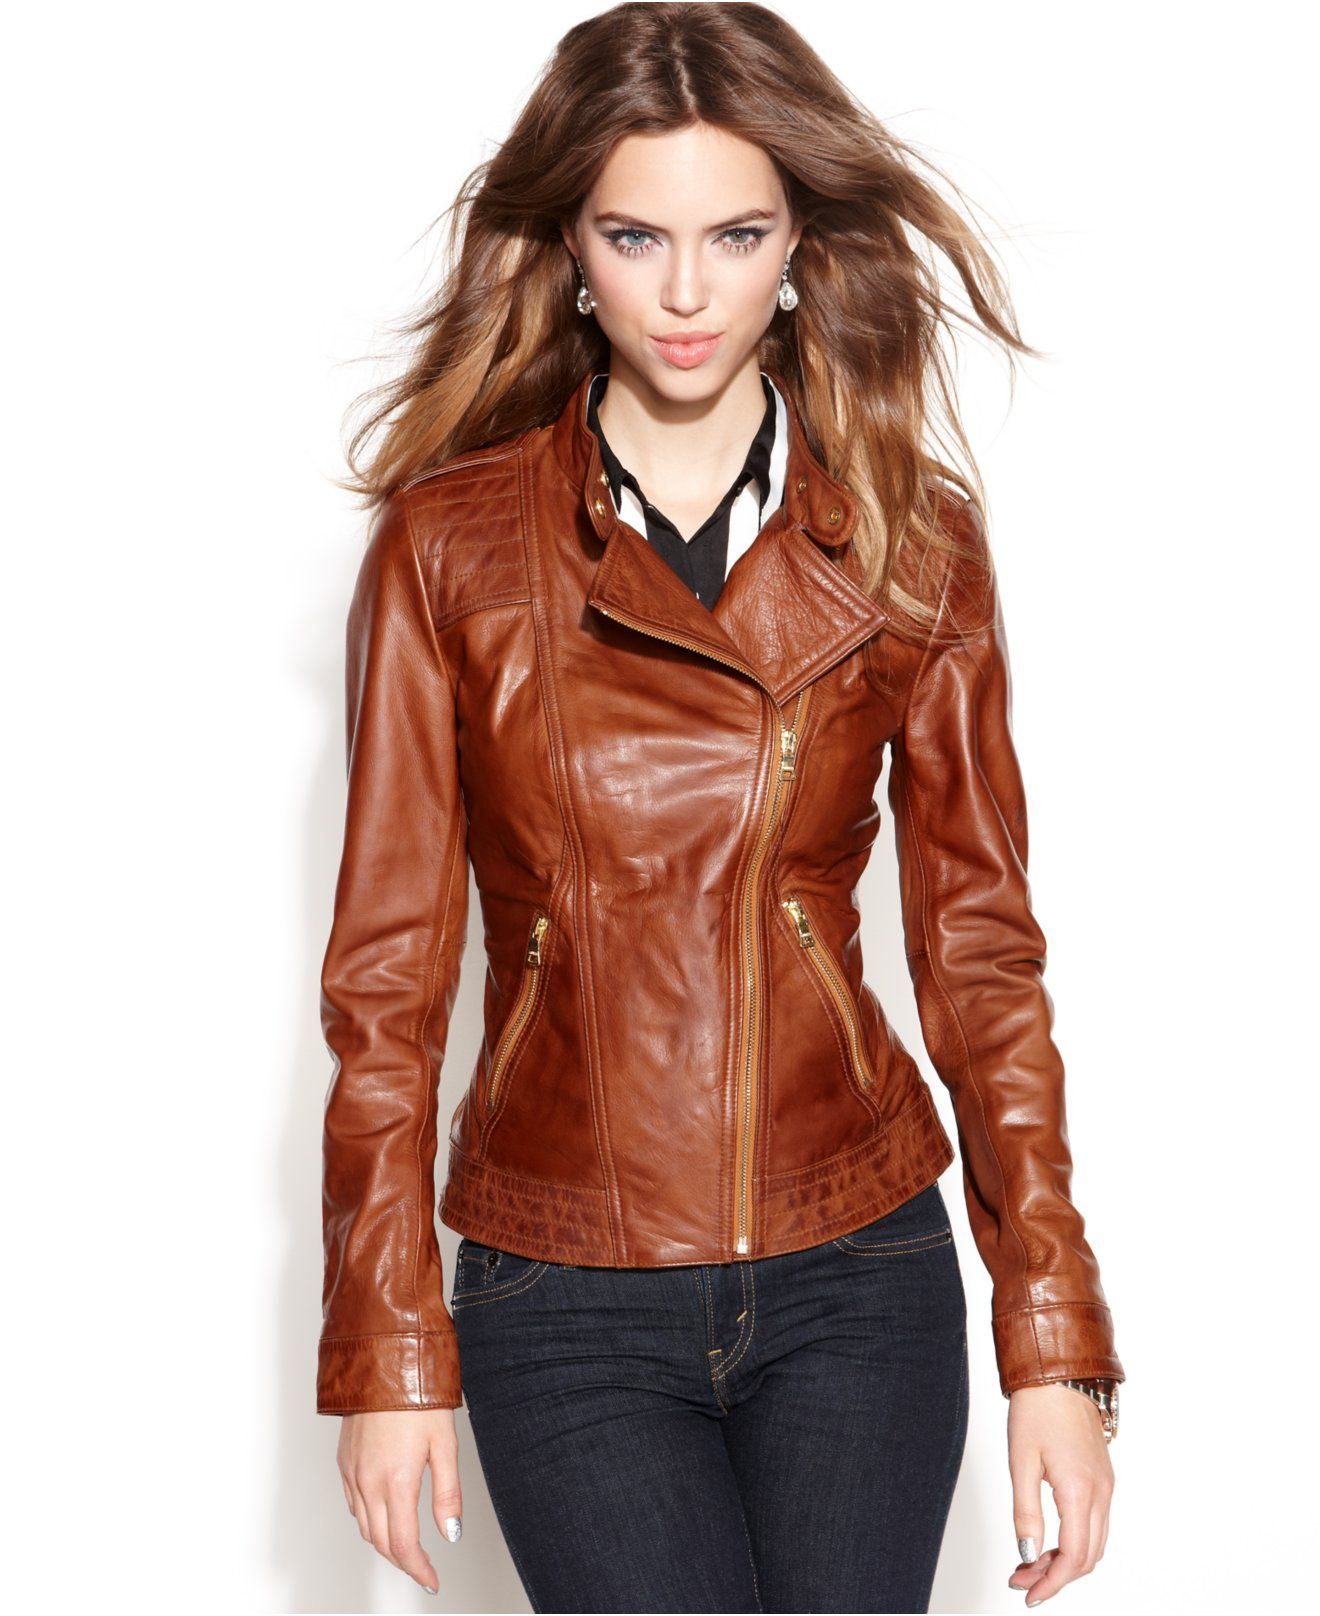 GUESS Asymmetrical Zip-Front Leather Jacket - Jackets U0026 Blazers - Women - Macyu0026#39;s | Fashion ...